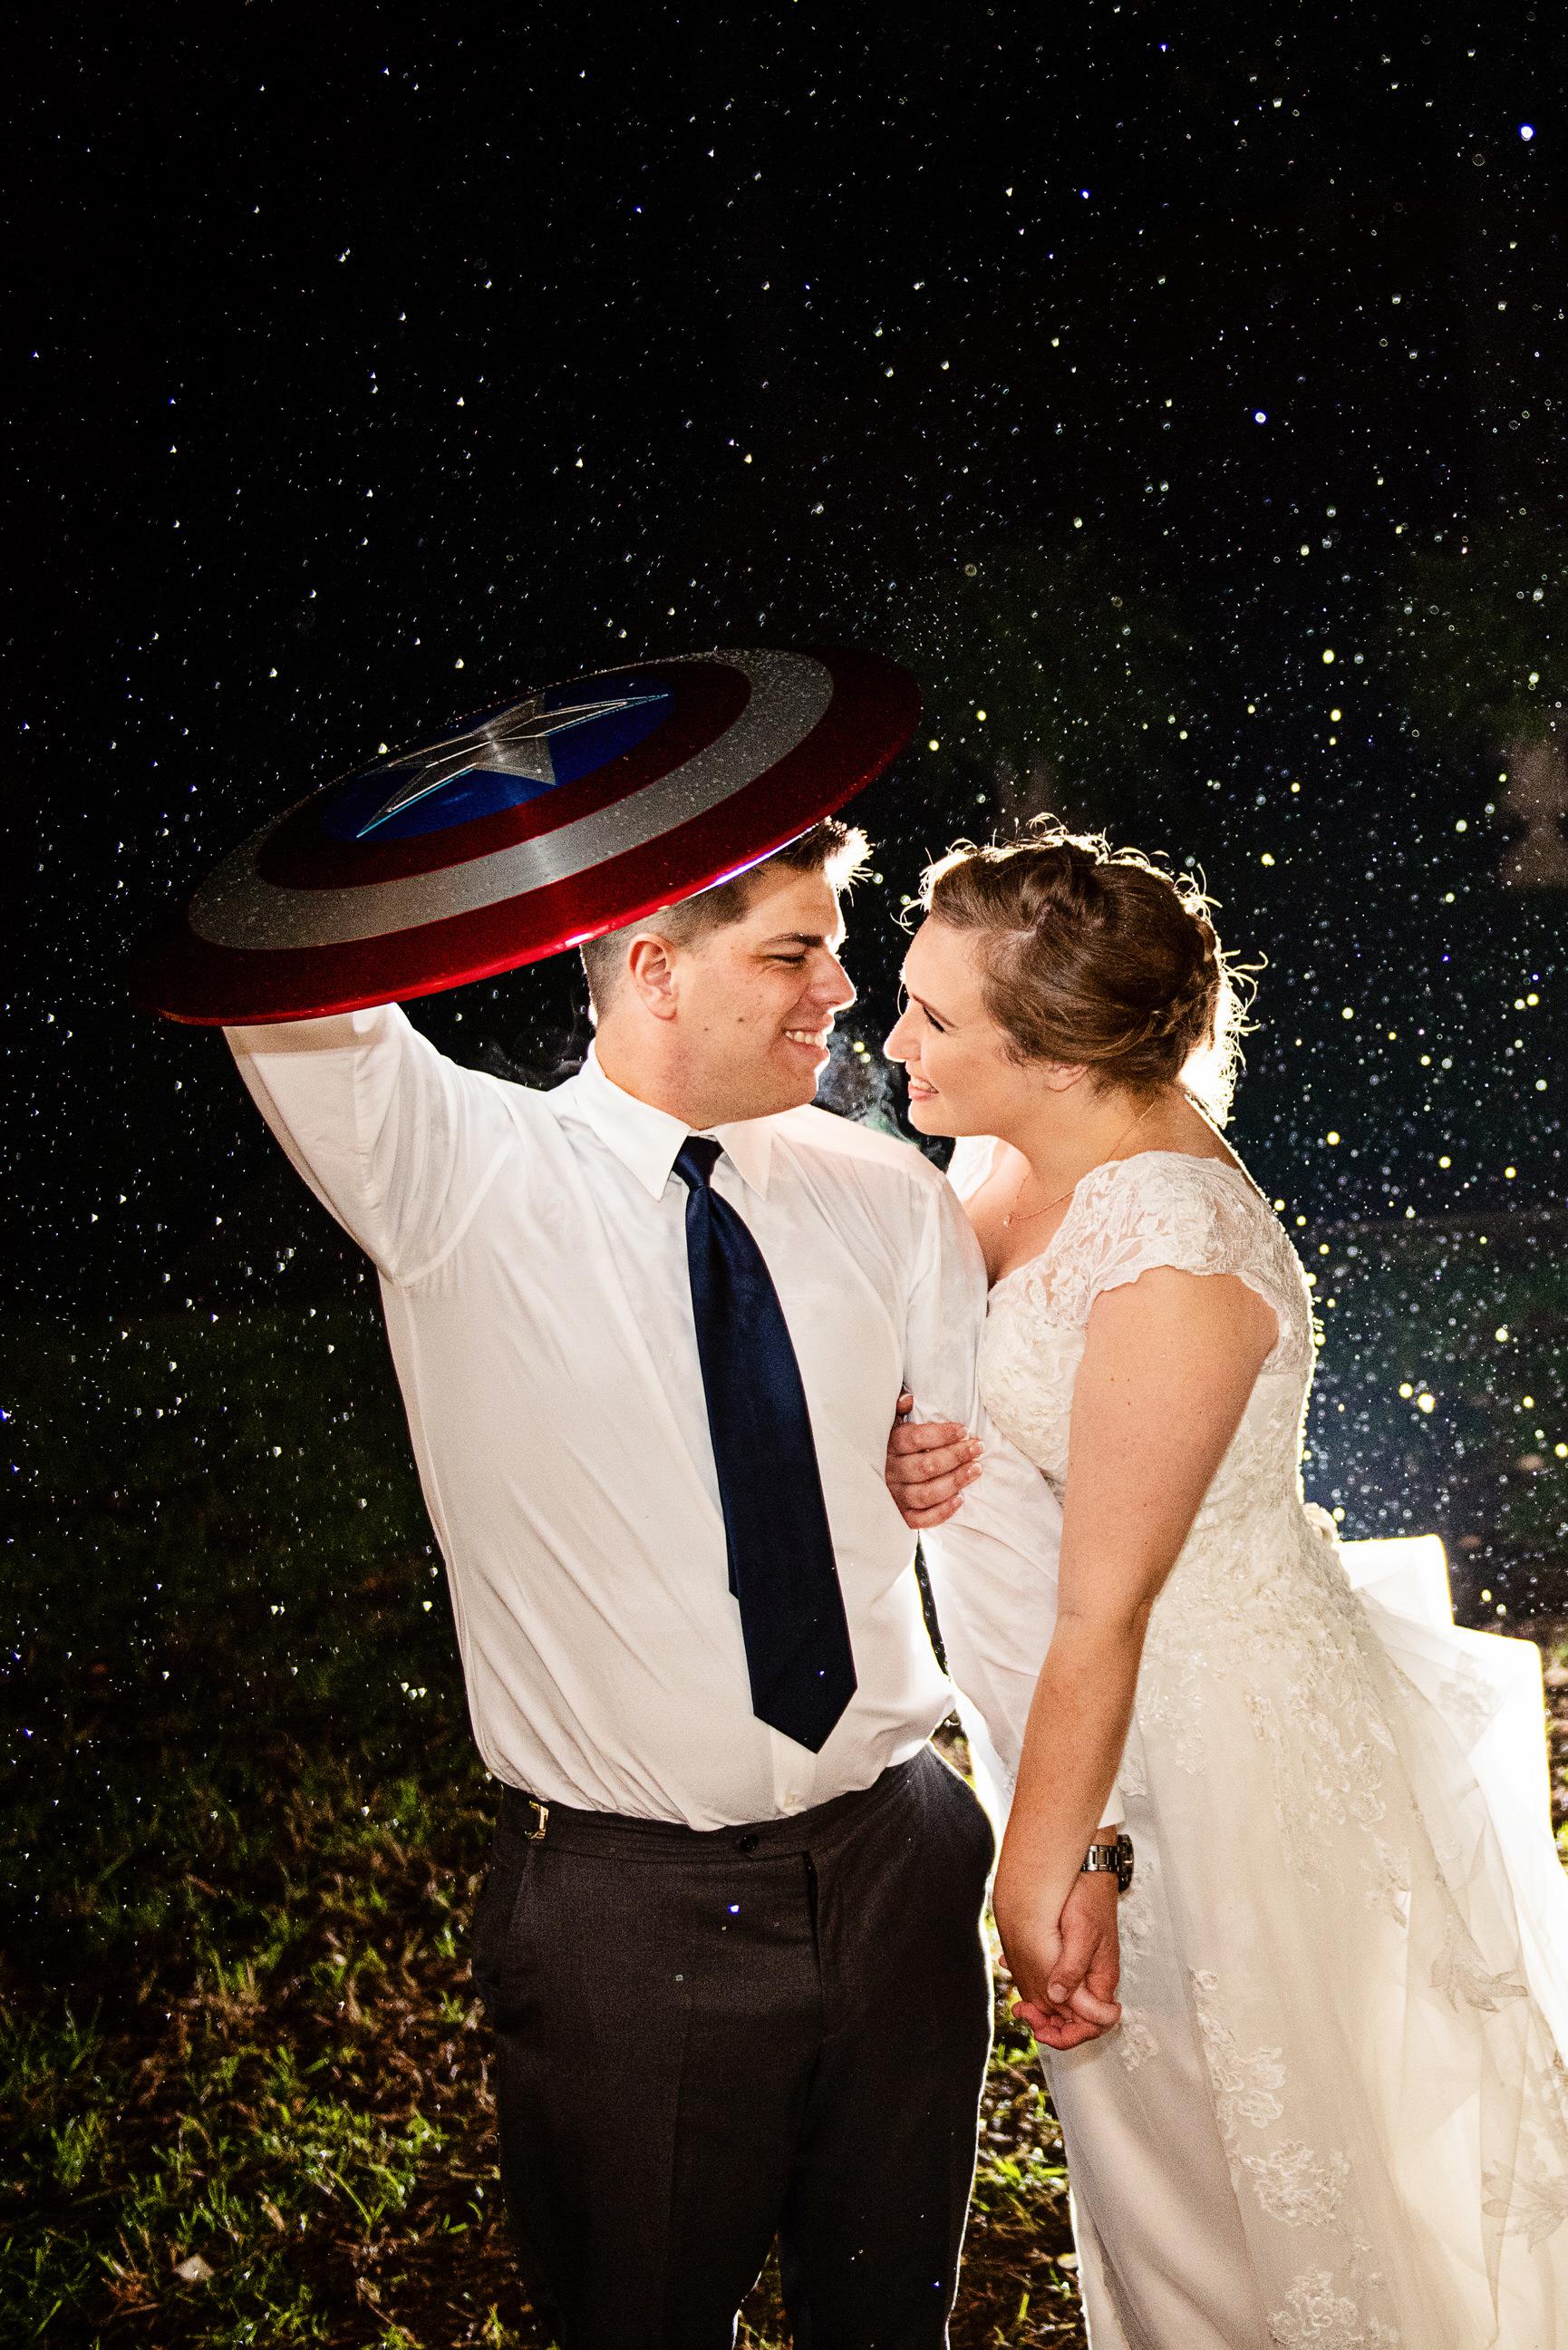 LiriodendronMansionWedding-Jackie&Levi-Night-10.jpg